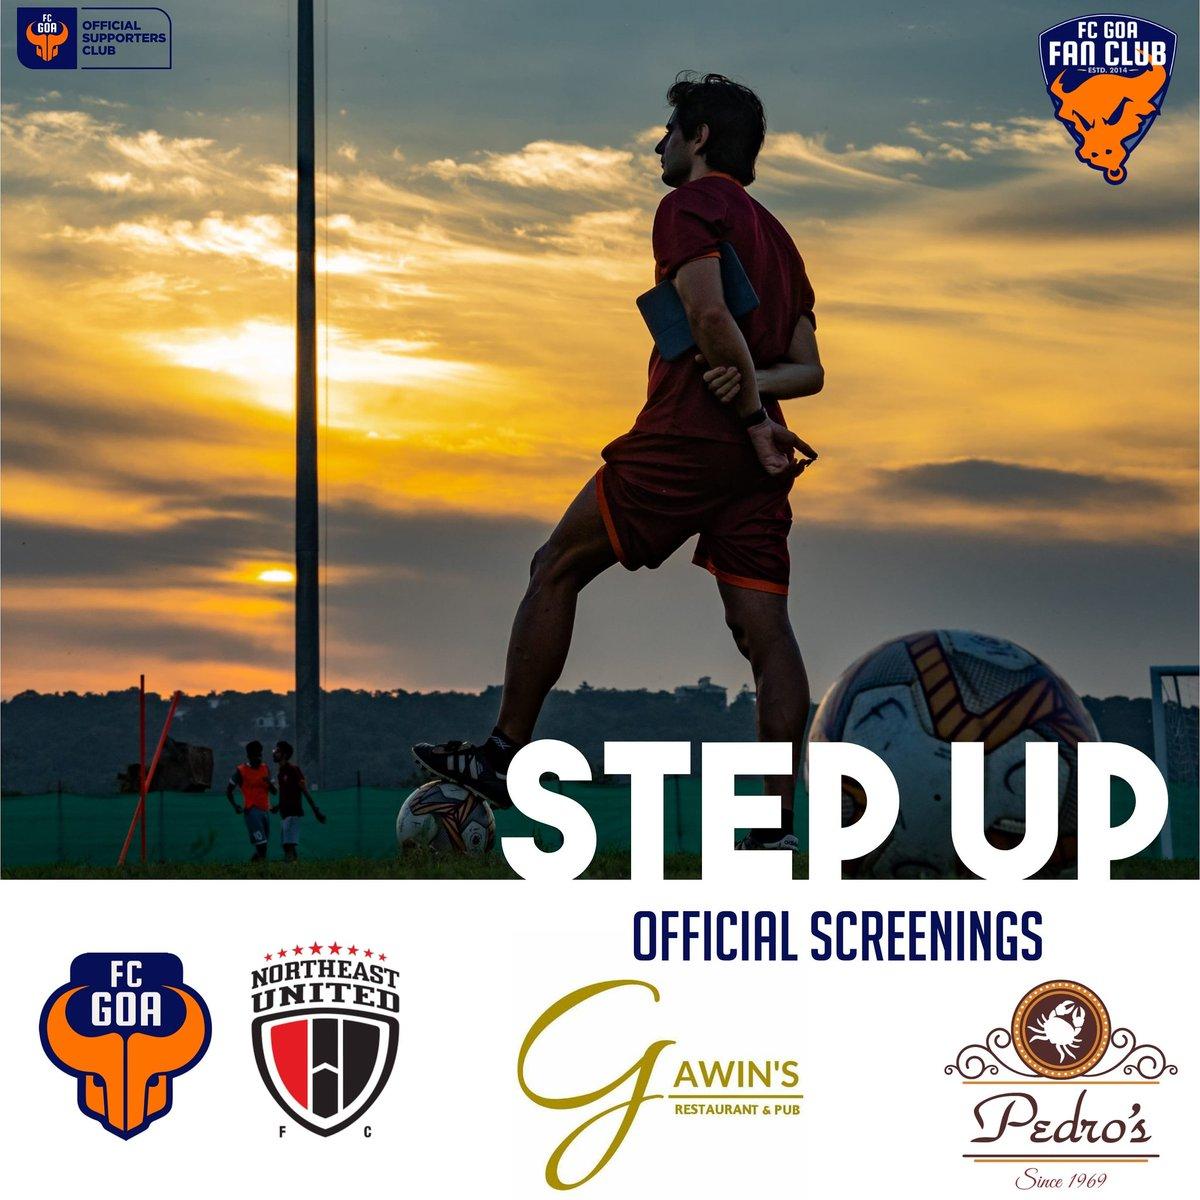 It's time to Step Up to the next level. See you at the Official FC Goa Screenings. . Venue 1: Gawin's (Quinta-De-Valadares), Verna Venue 2: Pedro's, Benaulim Beach . Monday 30th Nov 7:15 PM ; #FCGNEUFC . #RiseAgain #TikiTaka #VamosGoa #FCGoa #ForcaGoa #FCGoaFanClub #ISL